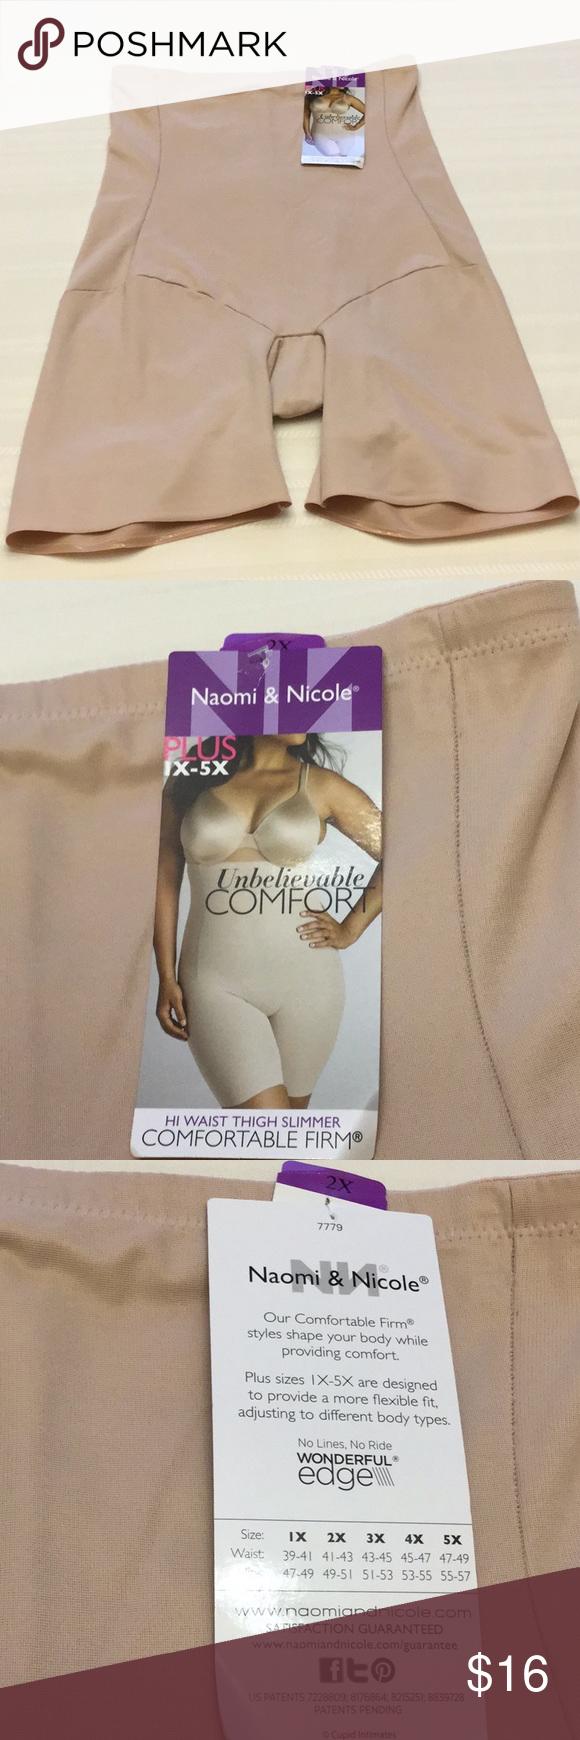 fa8705a1c958c Naomi   Nicole Comfort Firm Hi-Waist Thigh Slimmer Naomi   Nicole Plus  Unbelievable Comfort